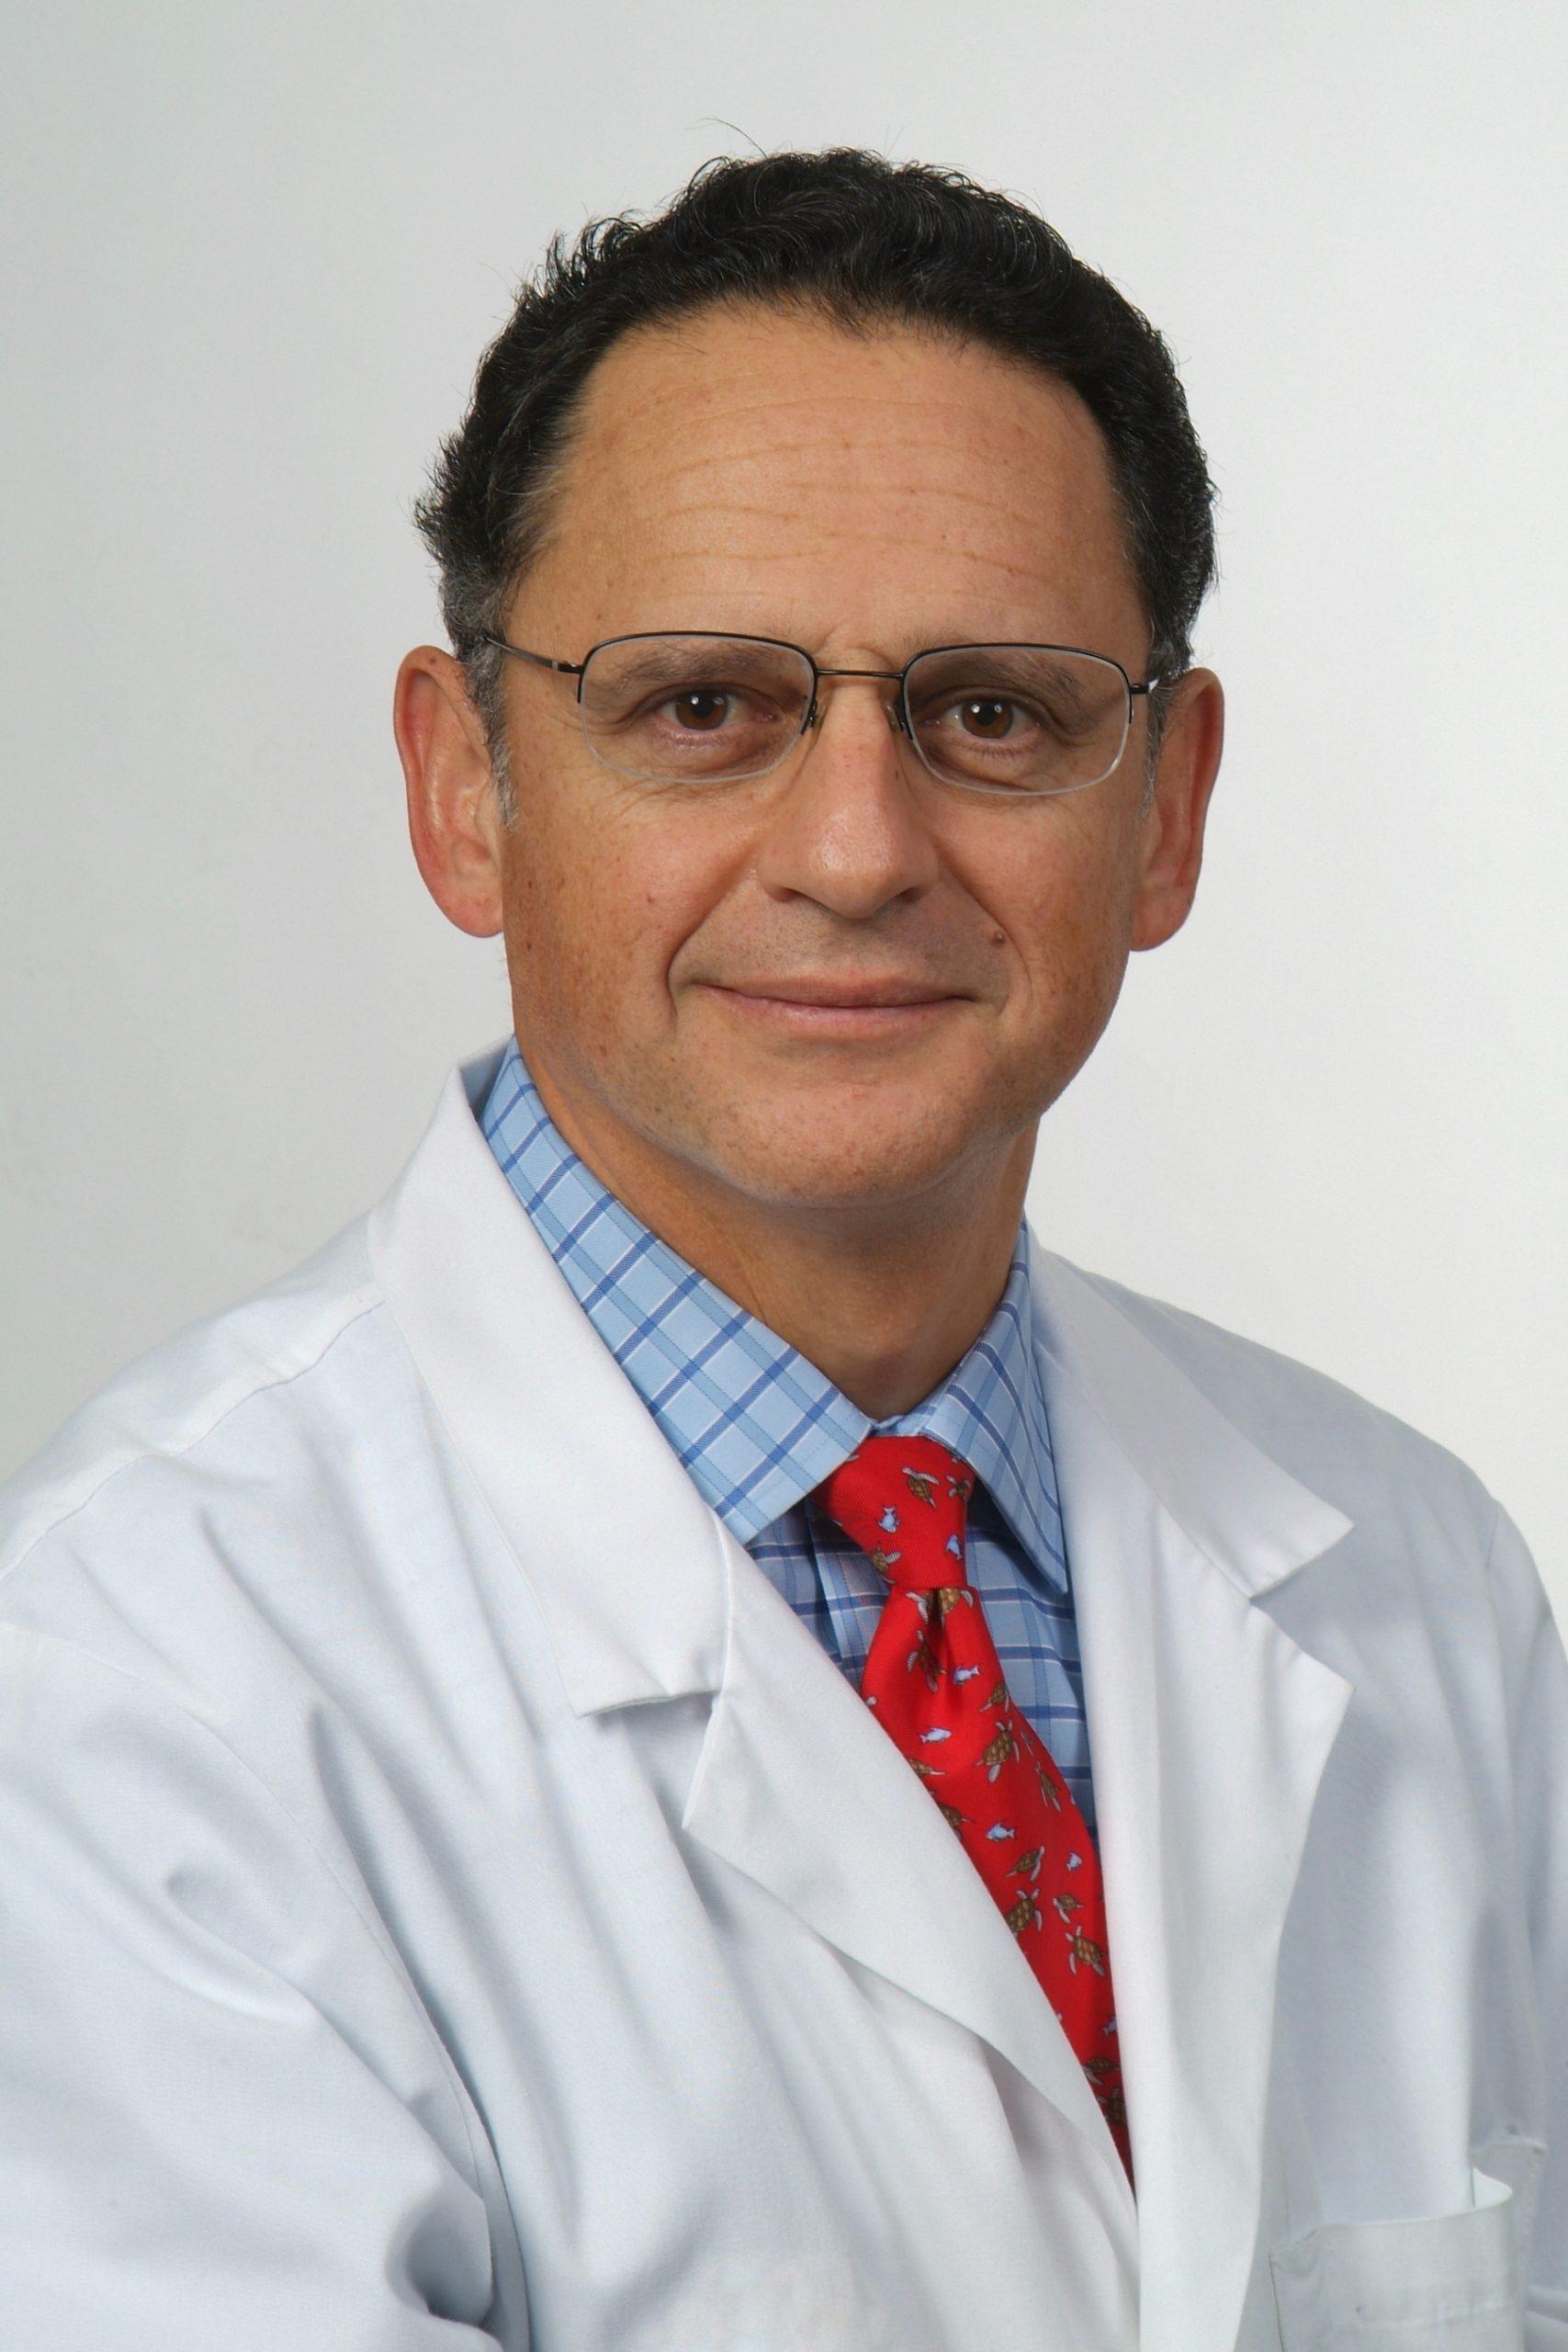 Fabian Alzamora General & Bariatric Surgery